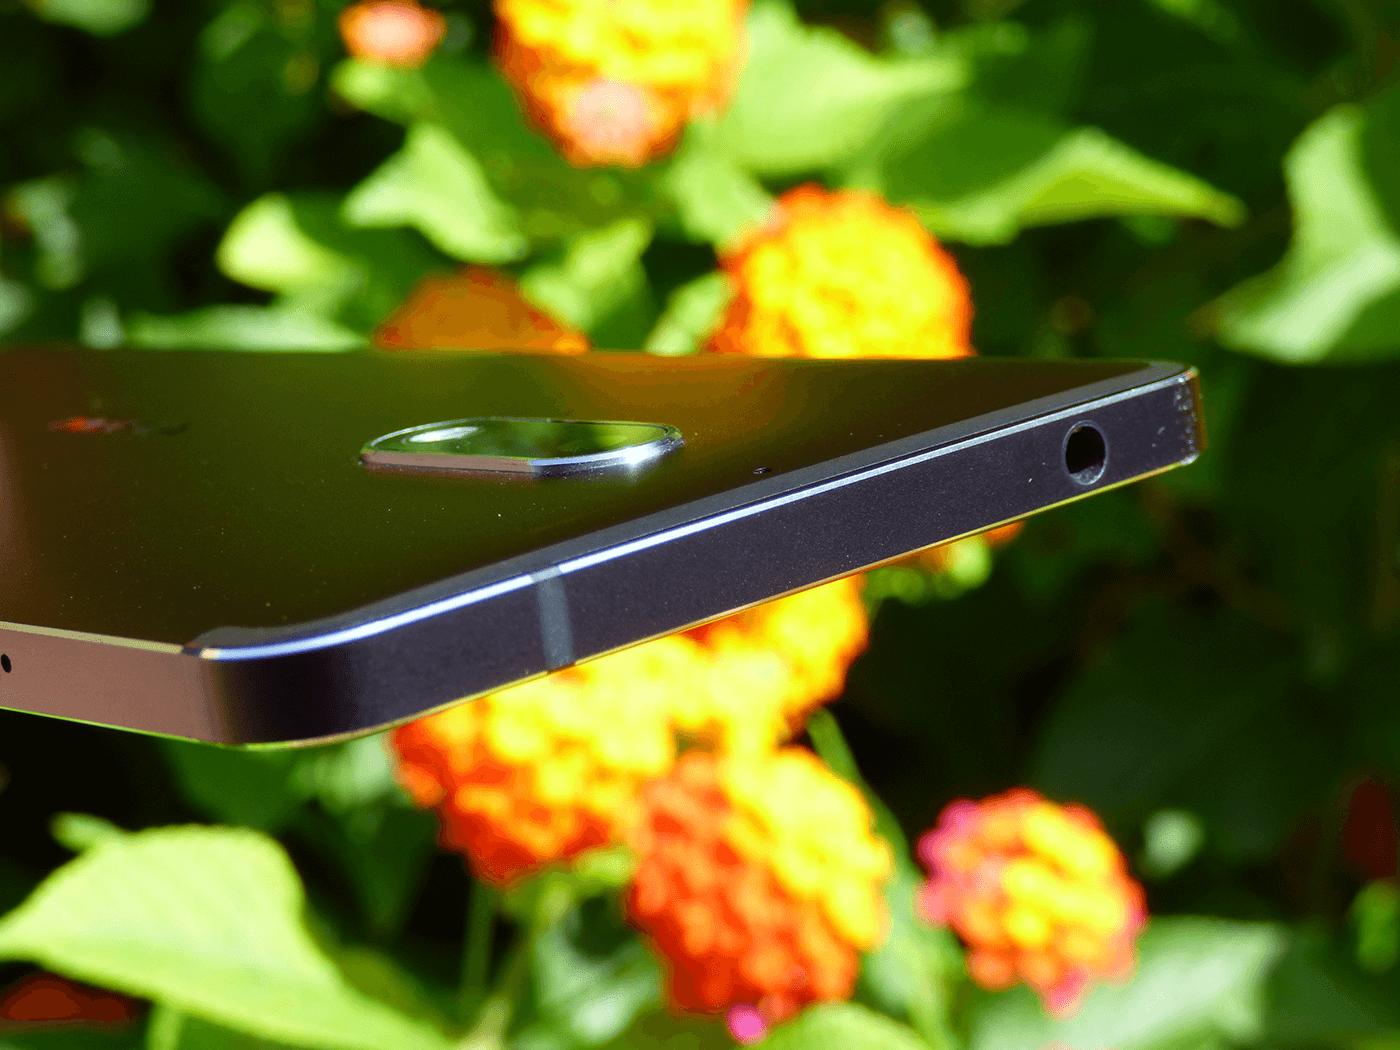 Jack de 3.5 mm del Nokia 6